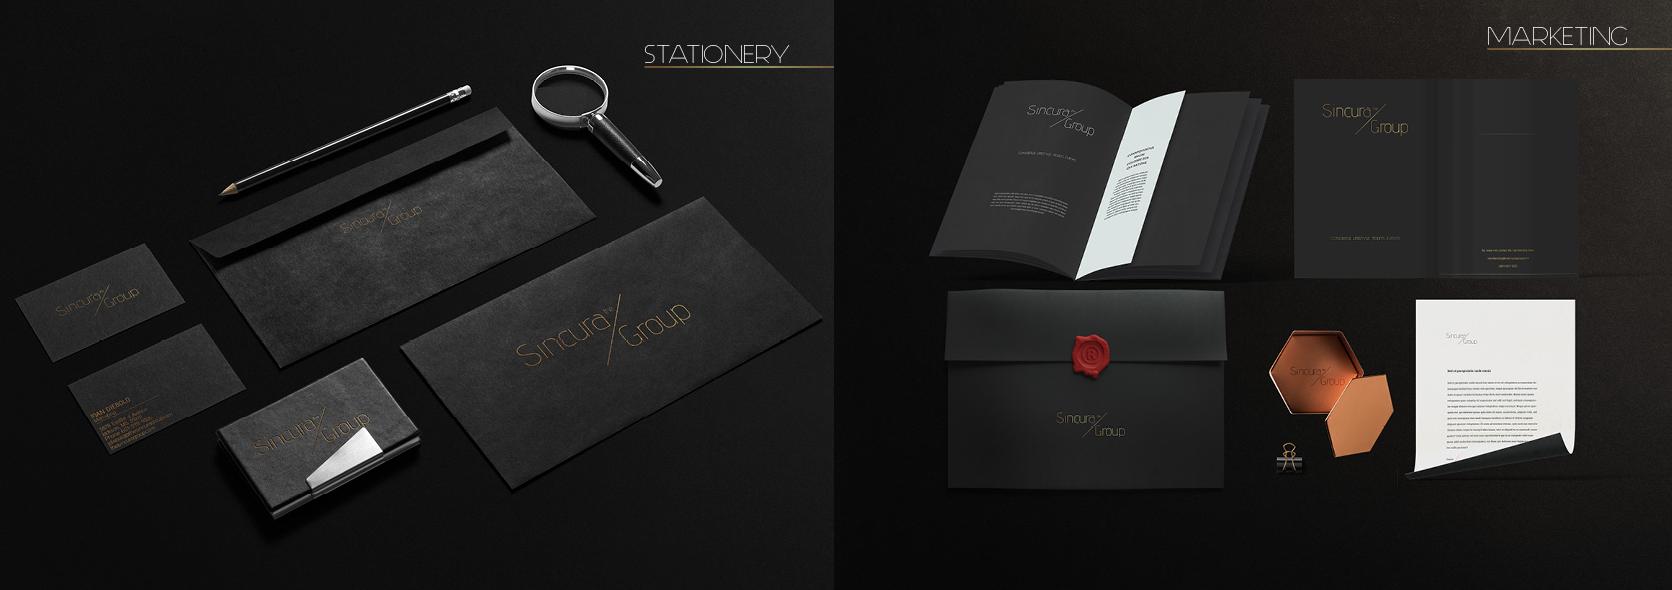 sincura branding deck